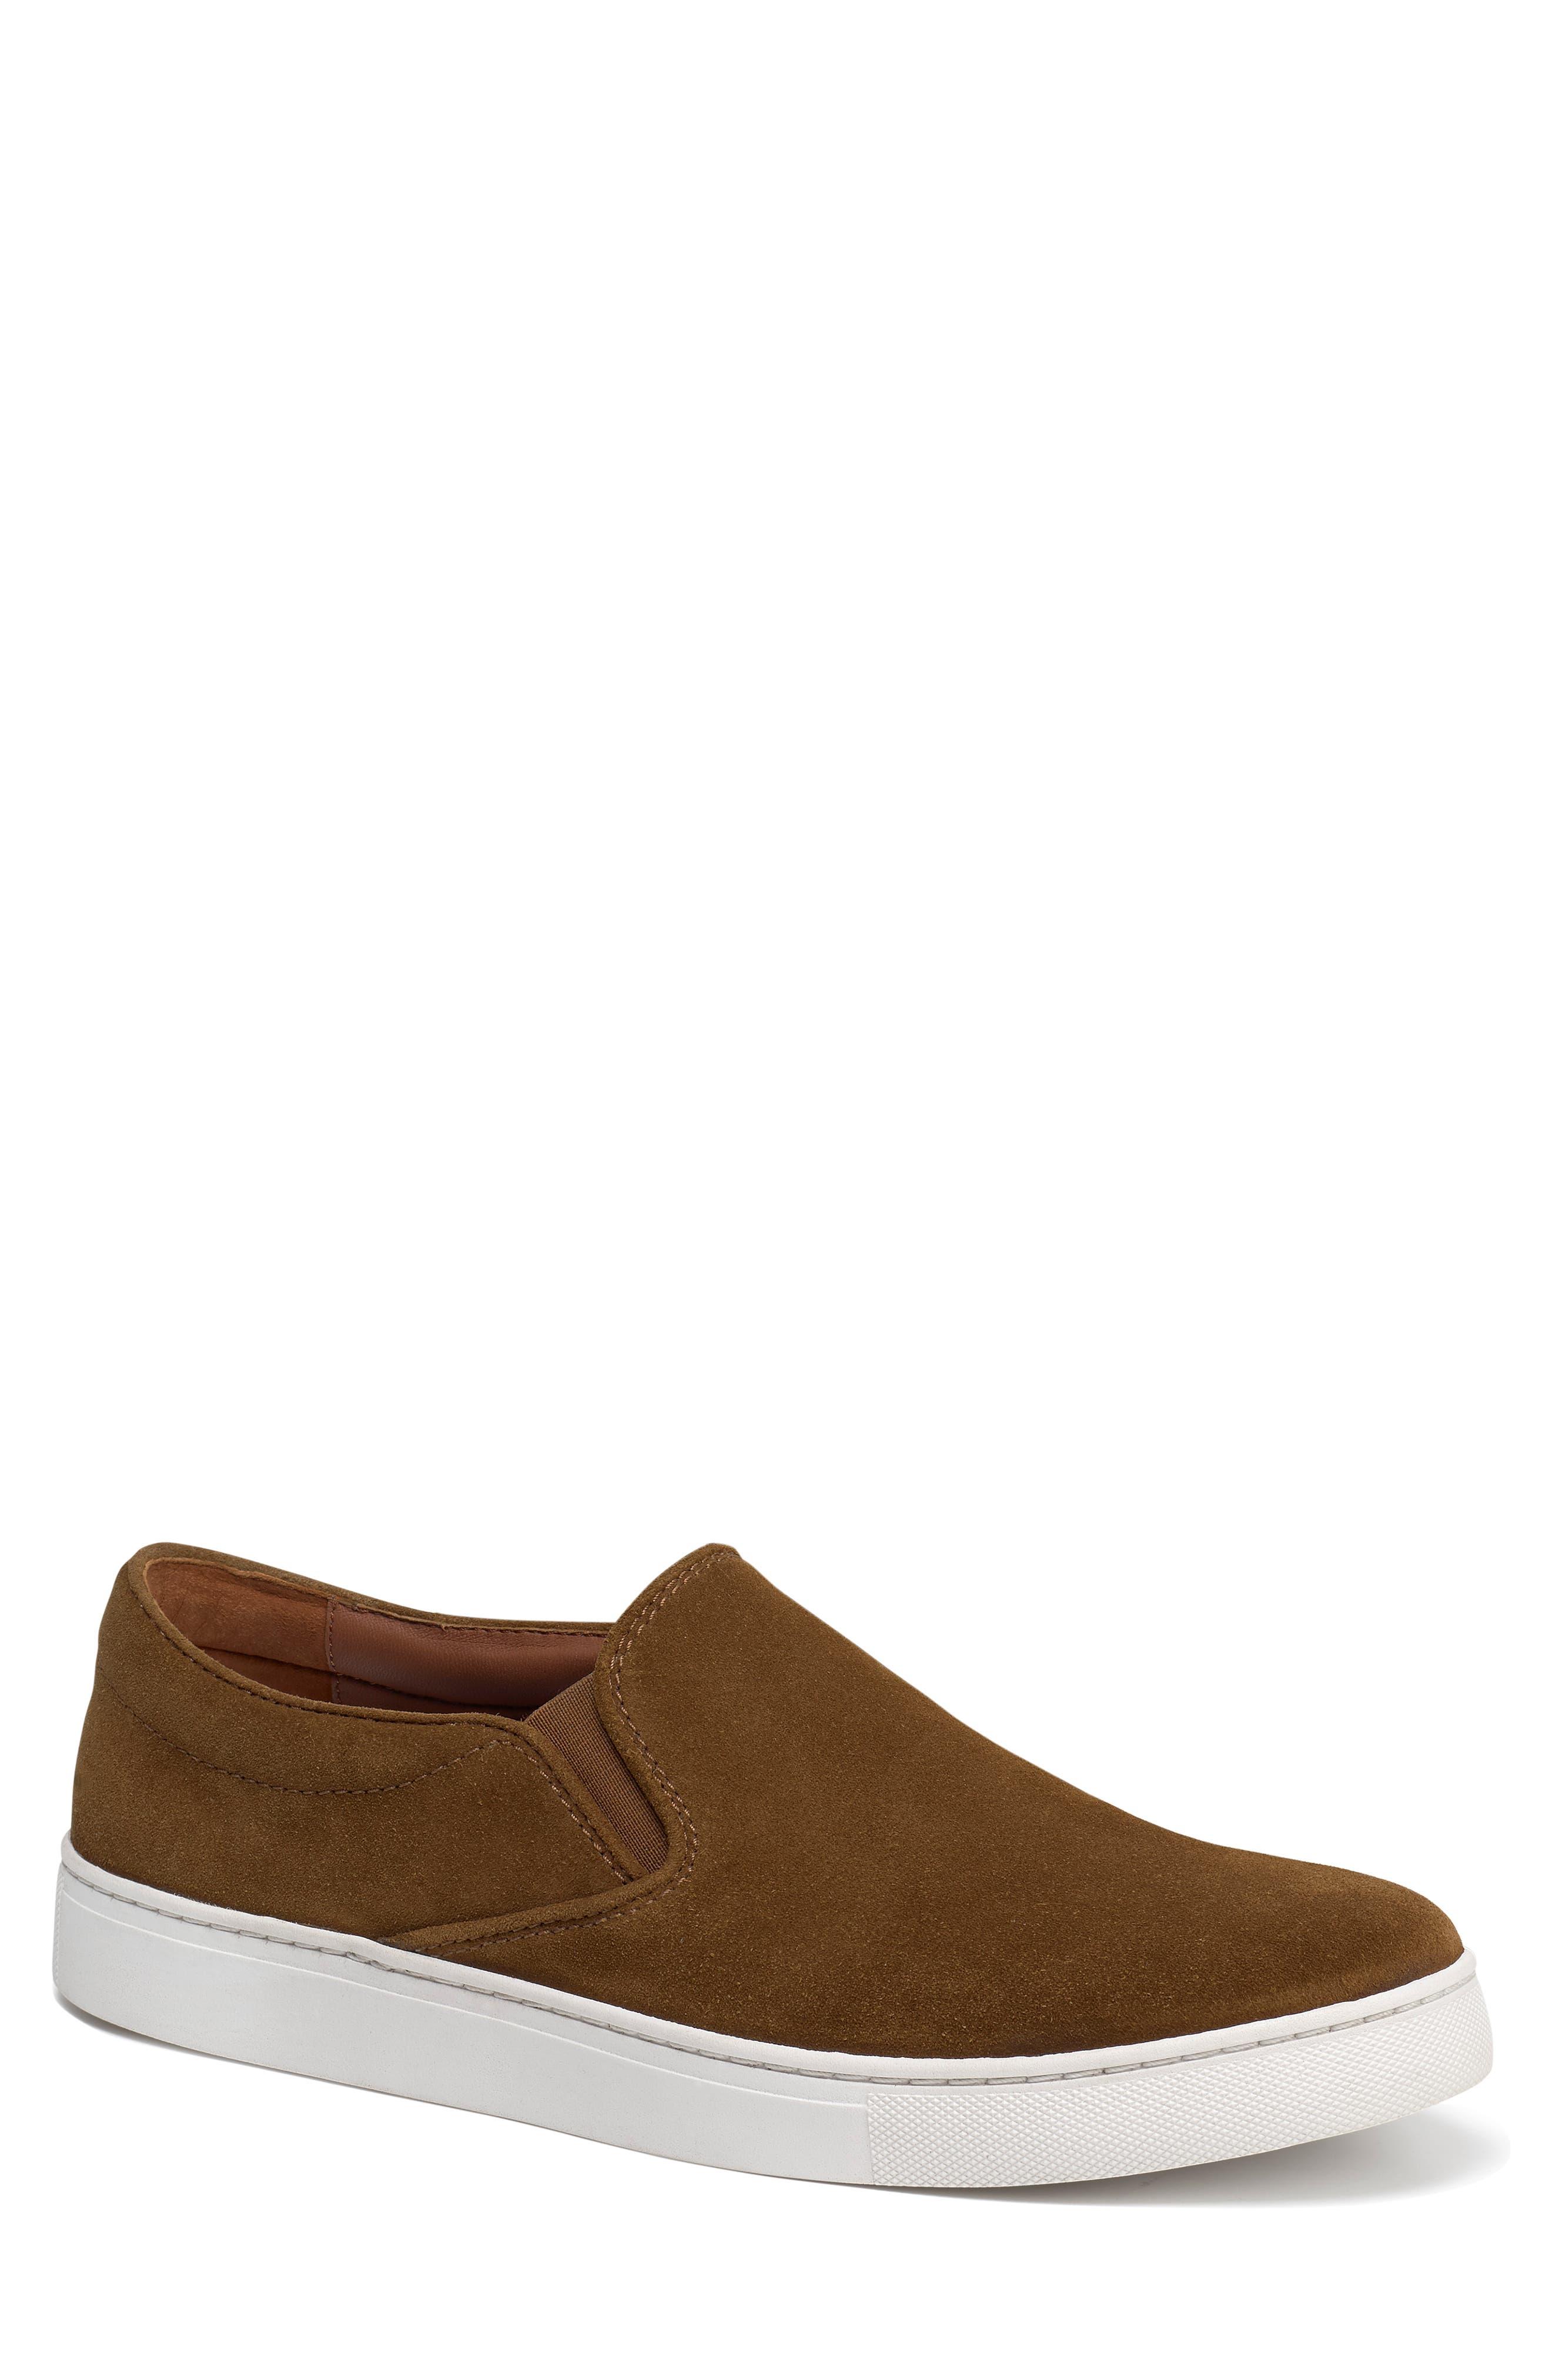 TRASK Alex Slip-On Sneaker, Main, color, SNUFF SUEDE